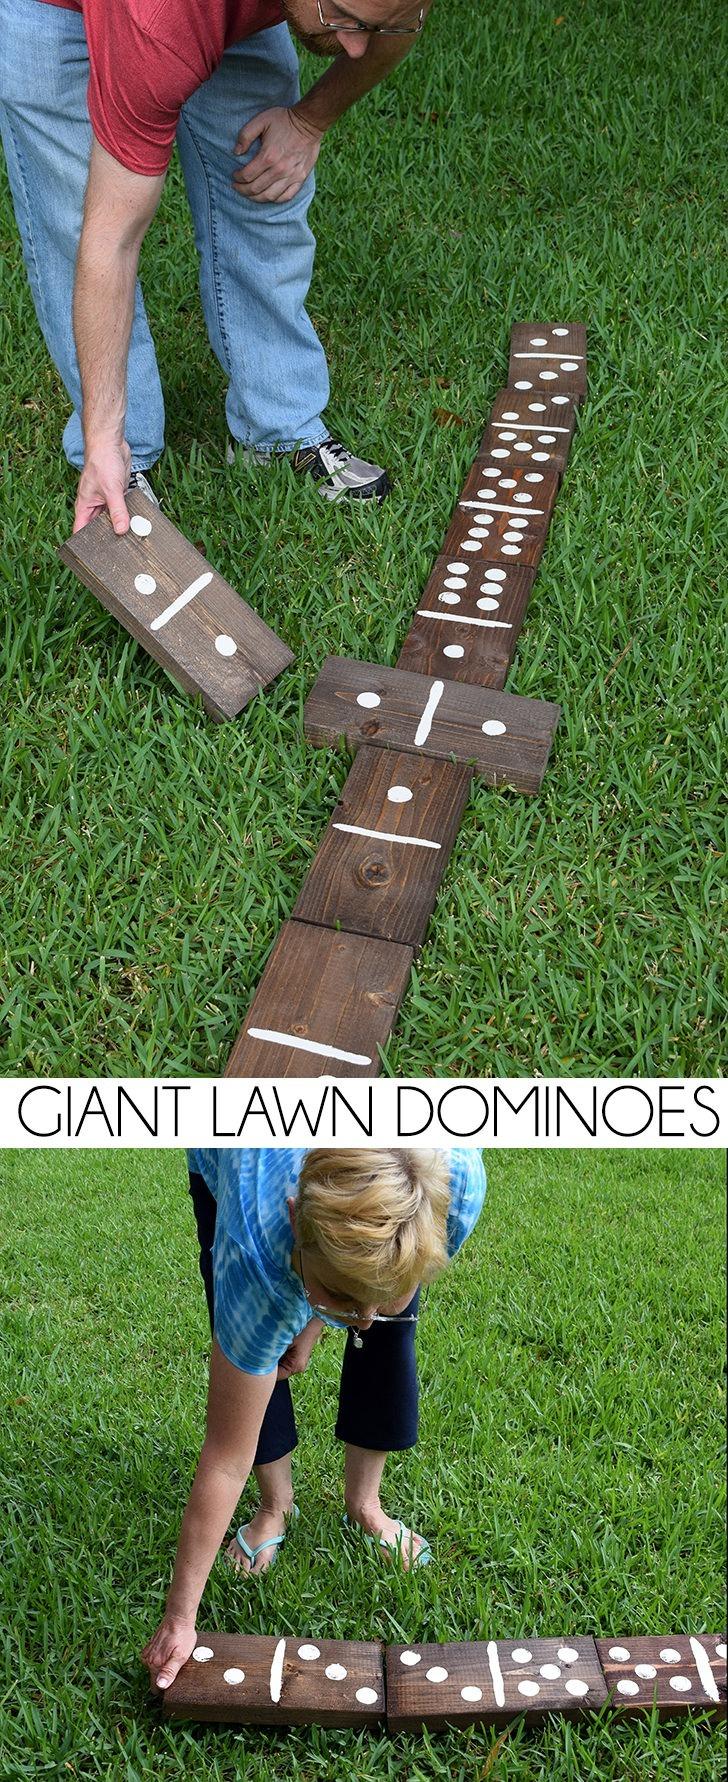 Giant Lawn Dominoes